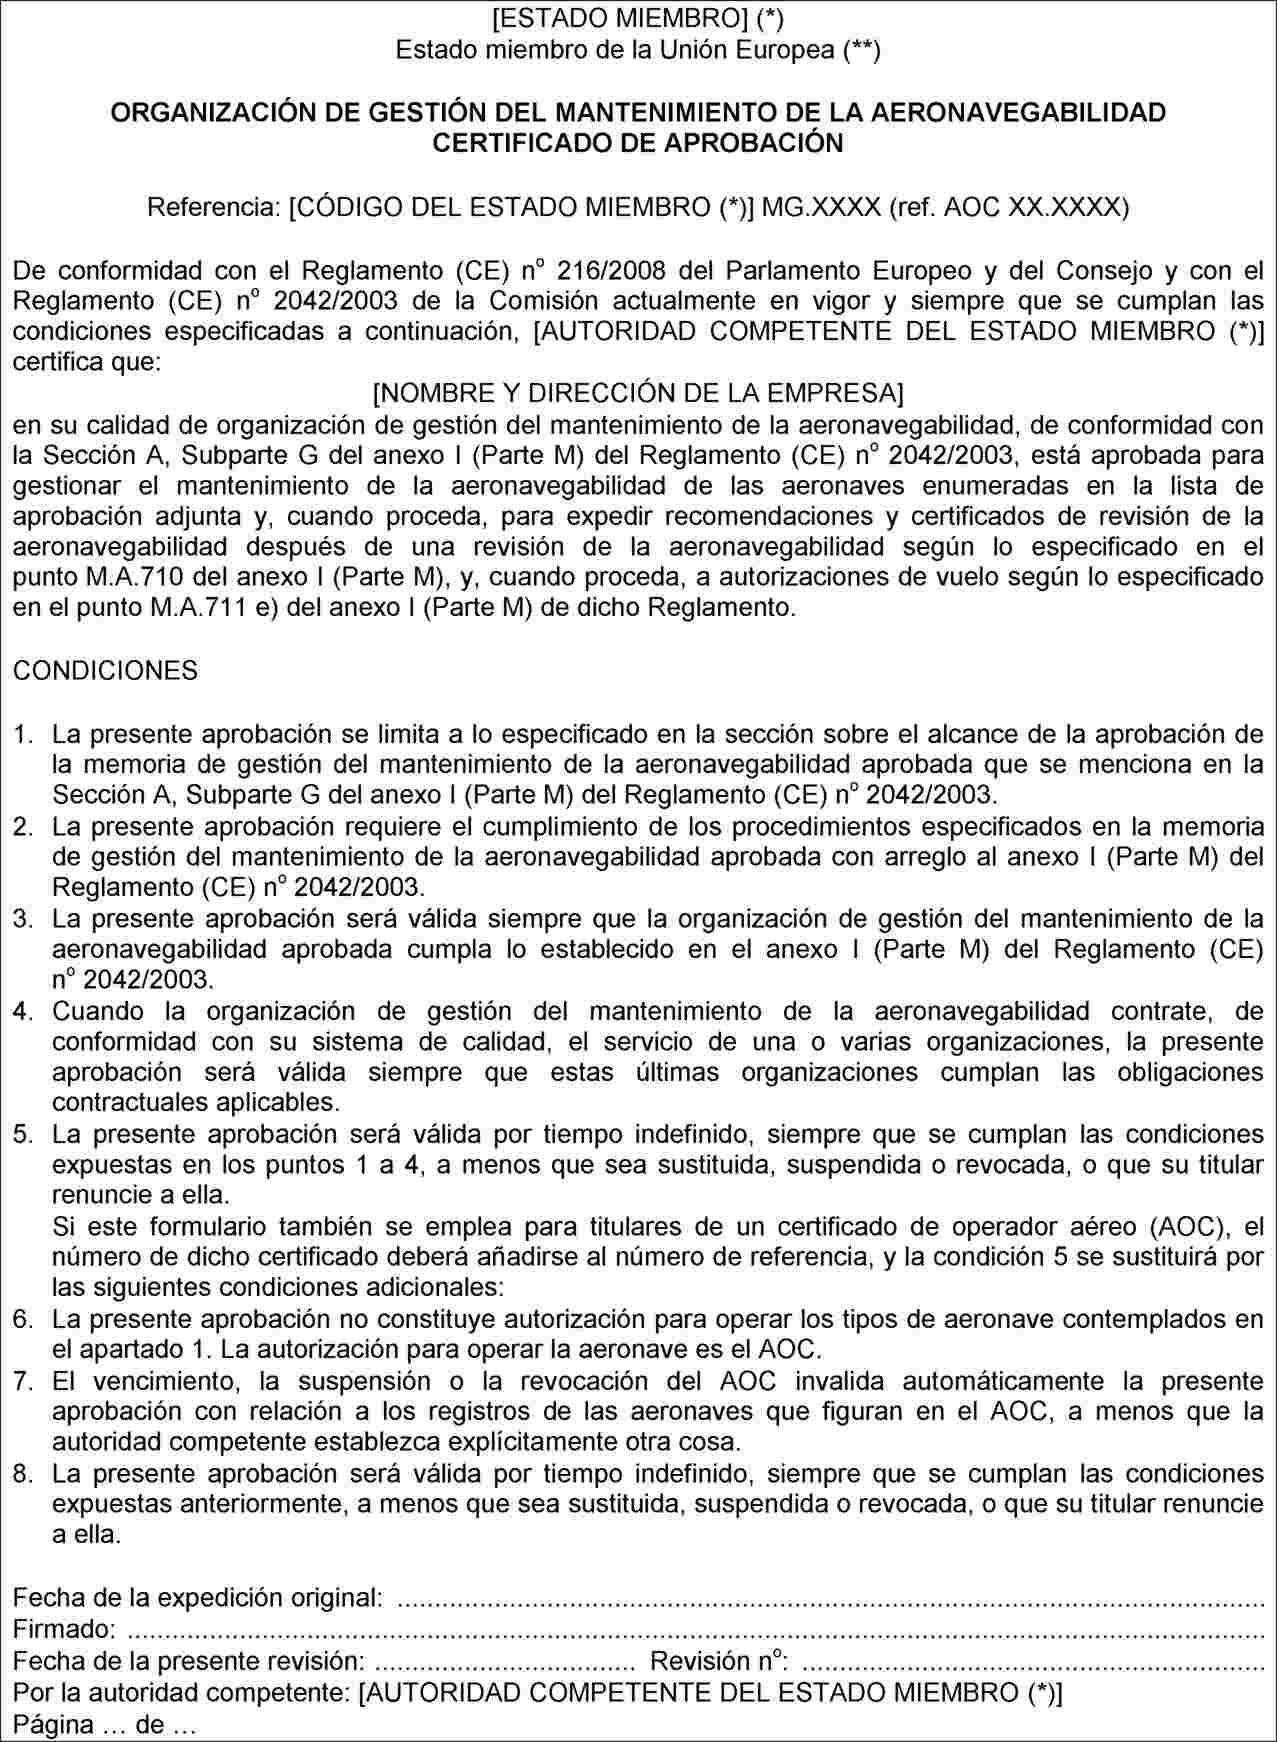 Imagen: https://eur-lex.europa.eu/resource.html?uri=uriserv:OJ.L_.2014.362.01.0001.01.SPA.xhtml.L_2014362ES.01006002.tif.jpg